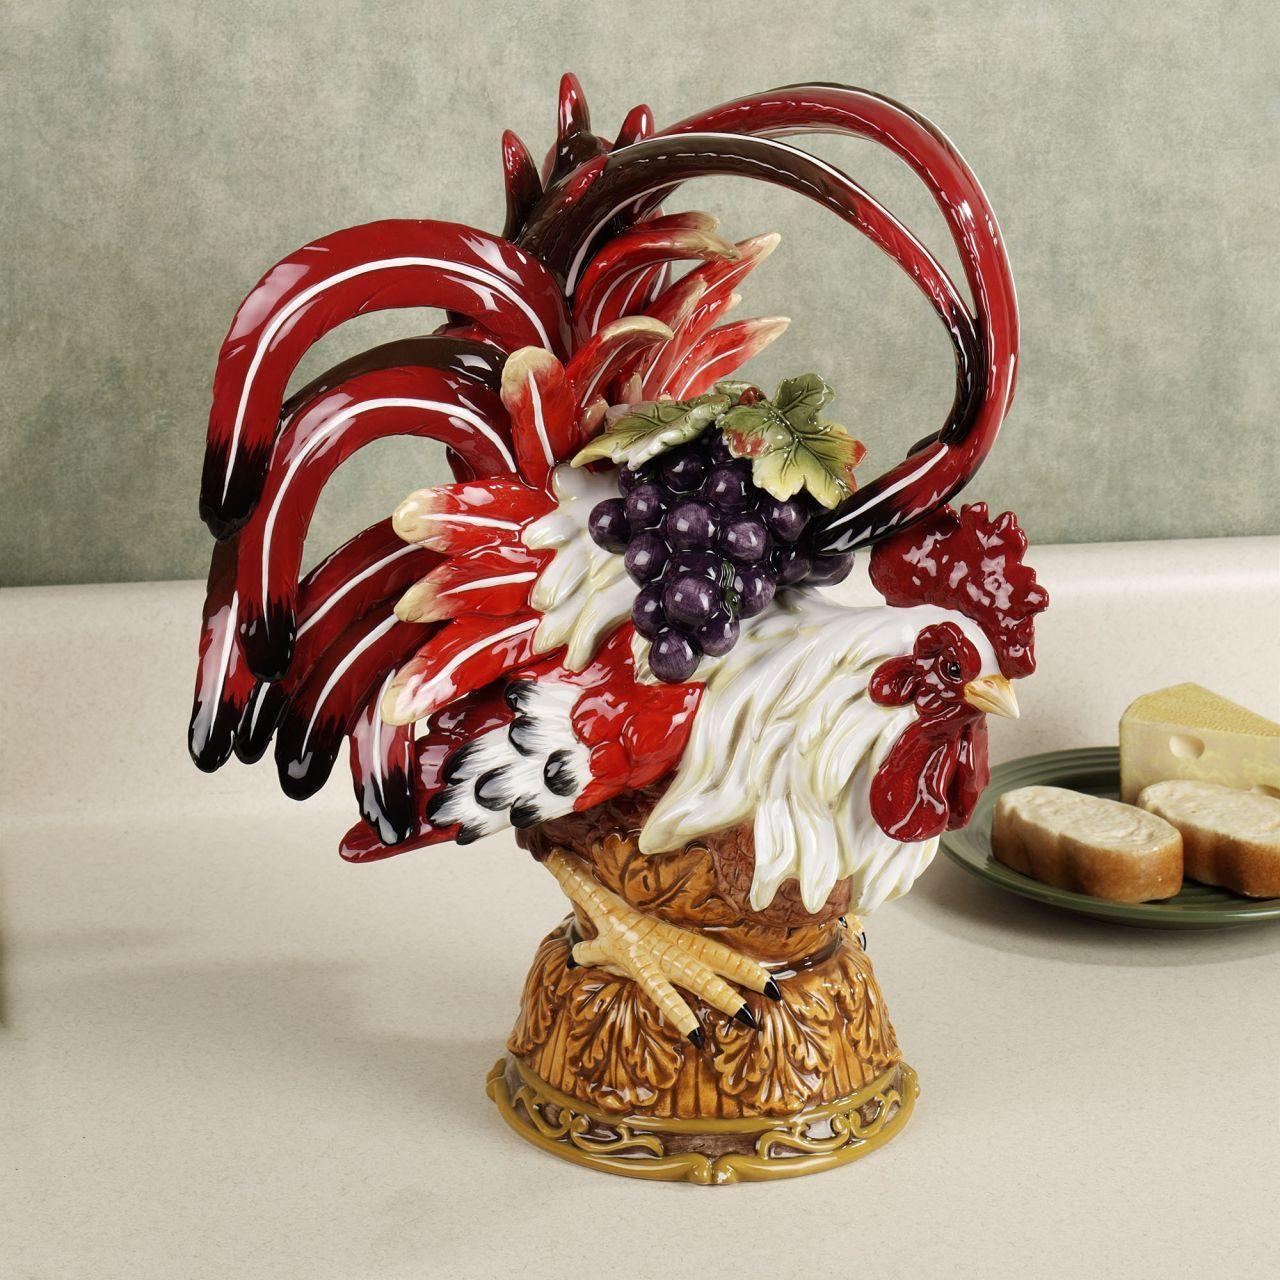 Best ideas about Rooster Kitchen Decor . Save or Pin ایدههای جدید برای چیدمان وسایل آشپزخانه مجله مد و Now.